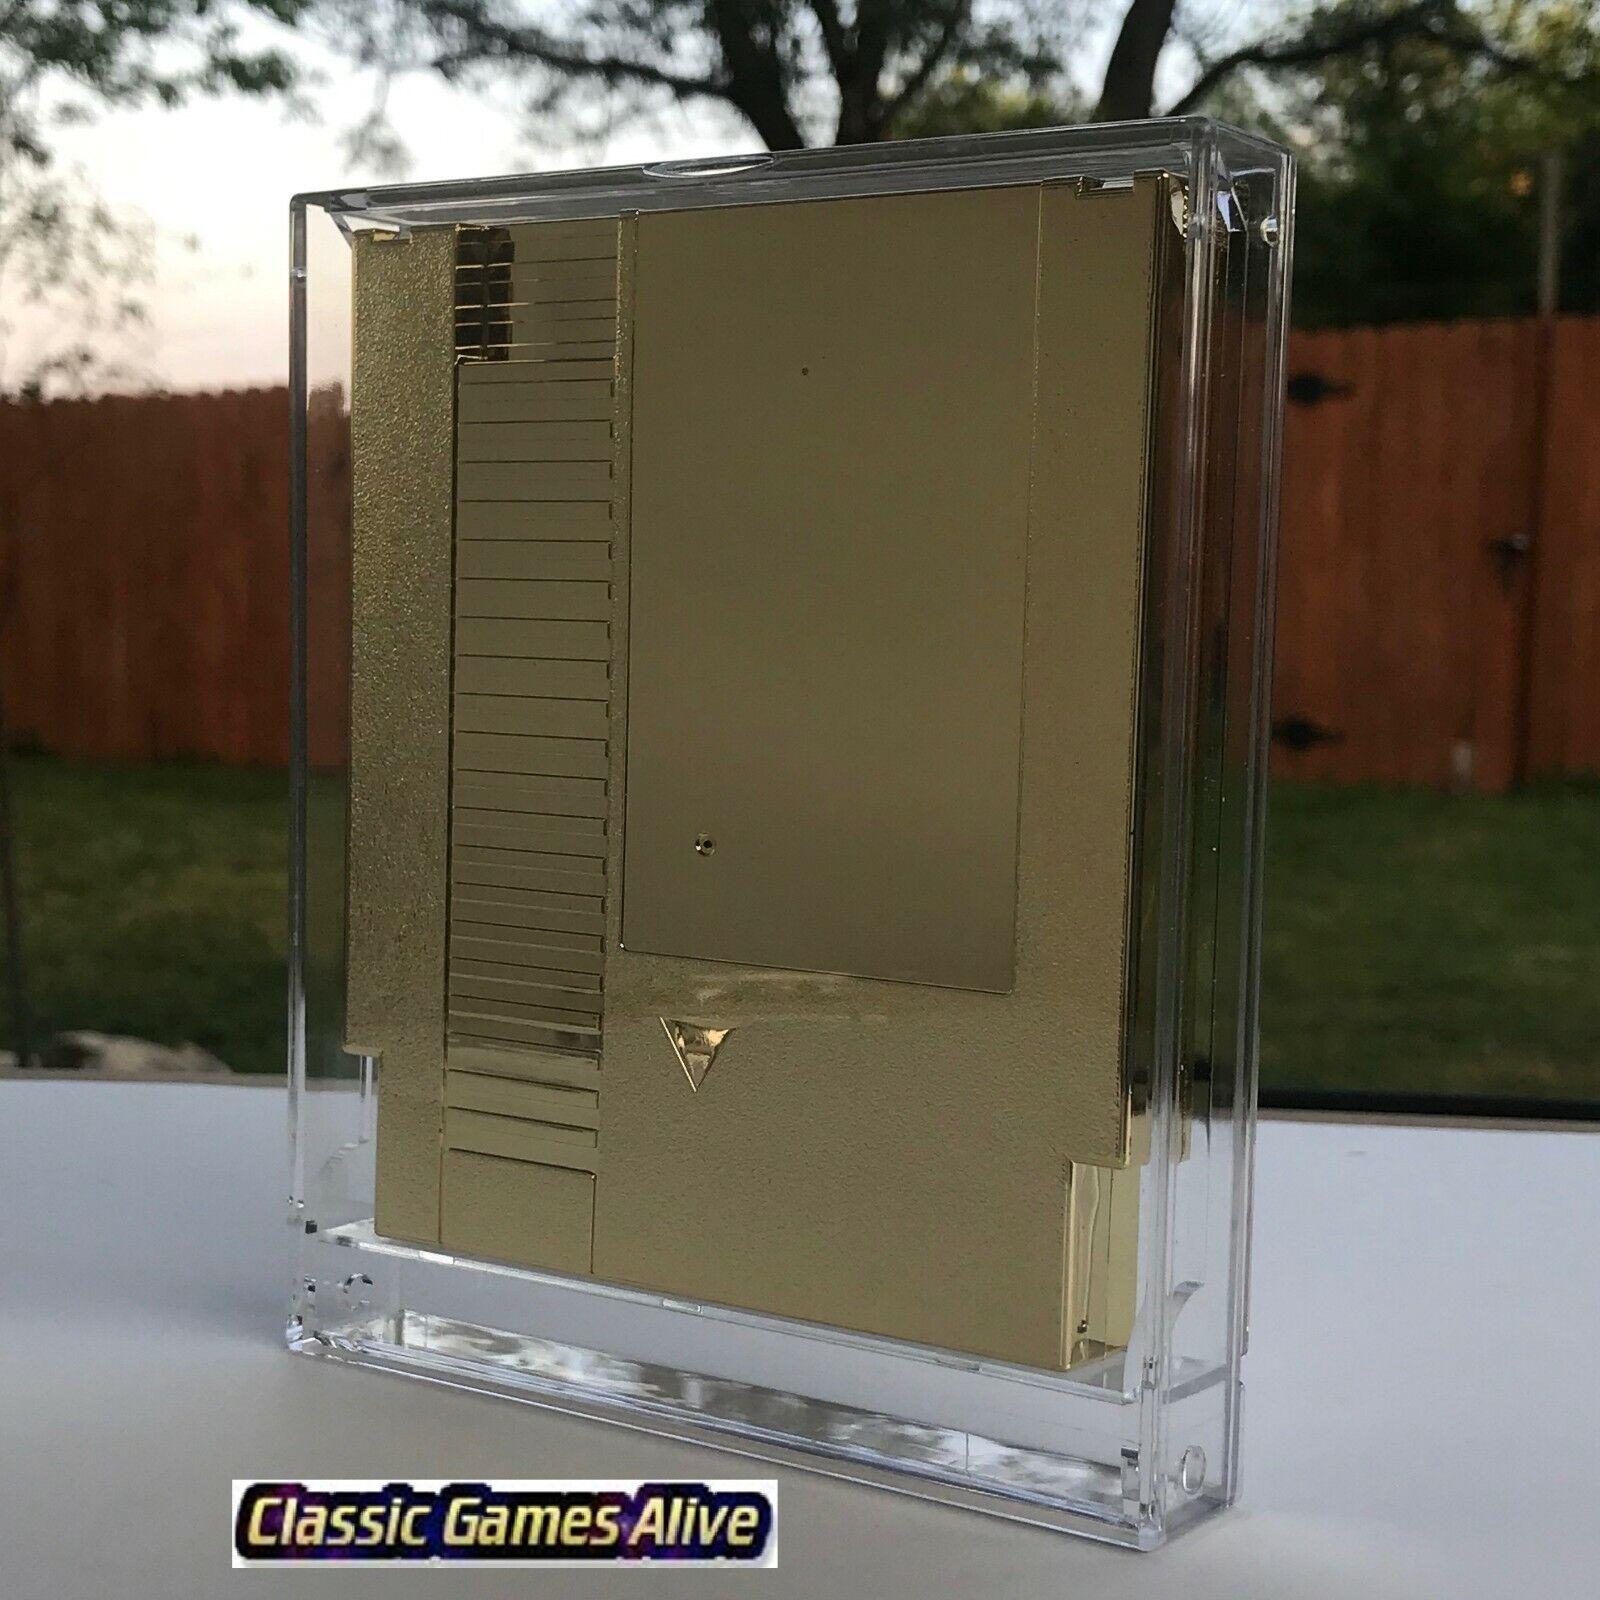 Best Nintendo NES Video Game Cartridge Display Case